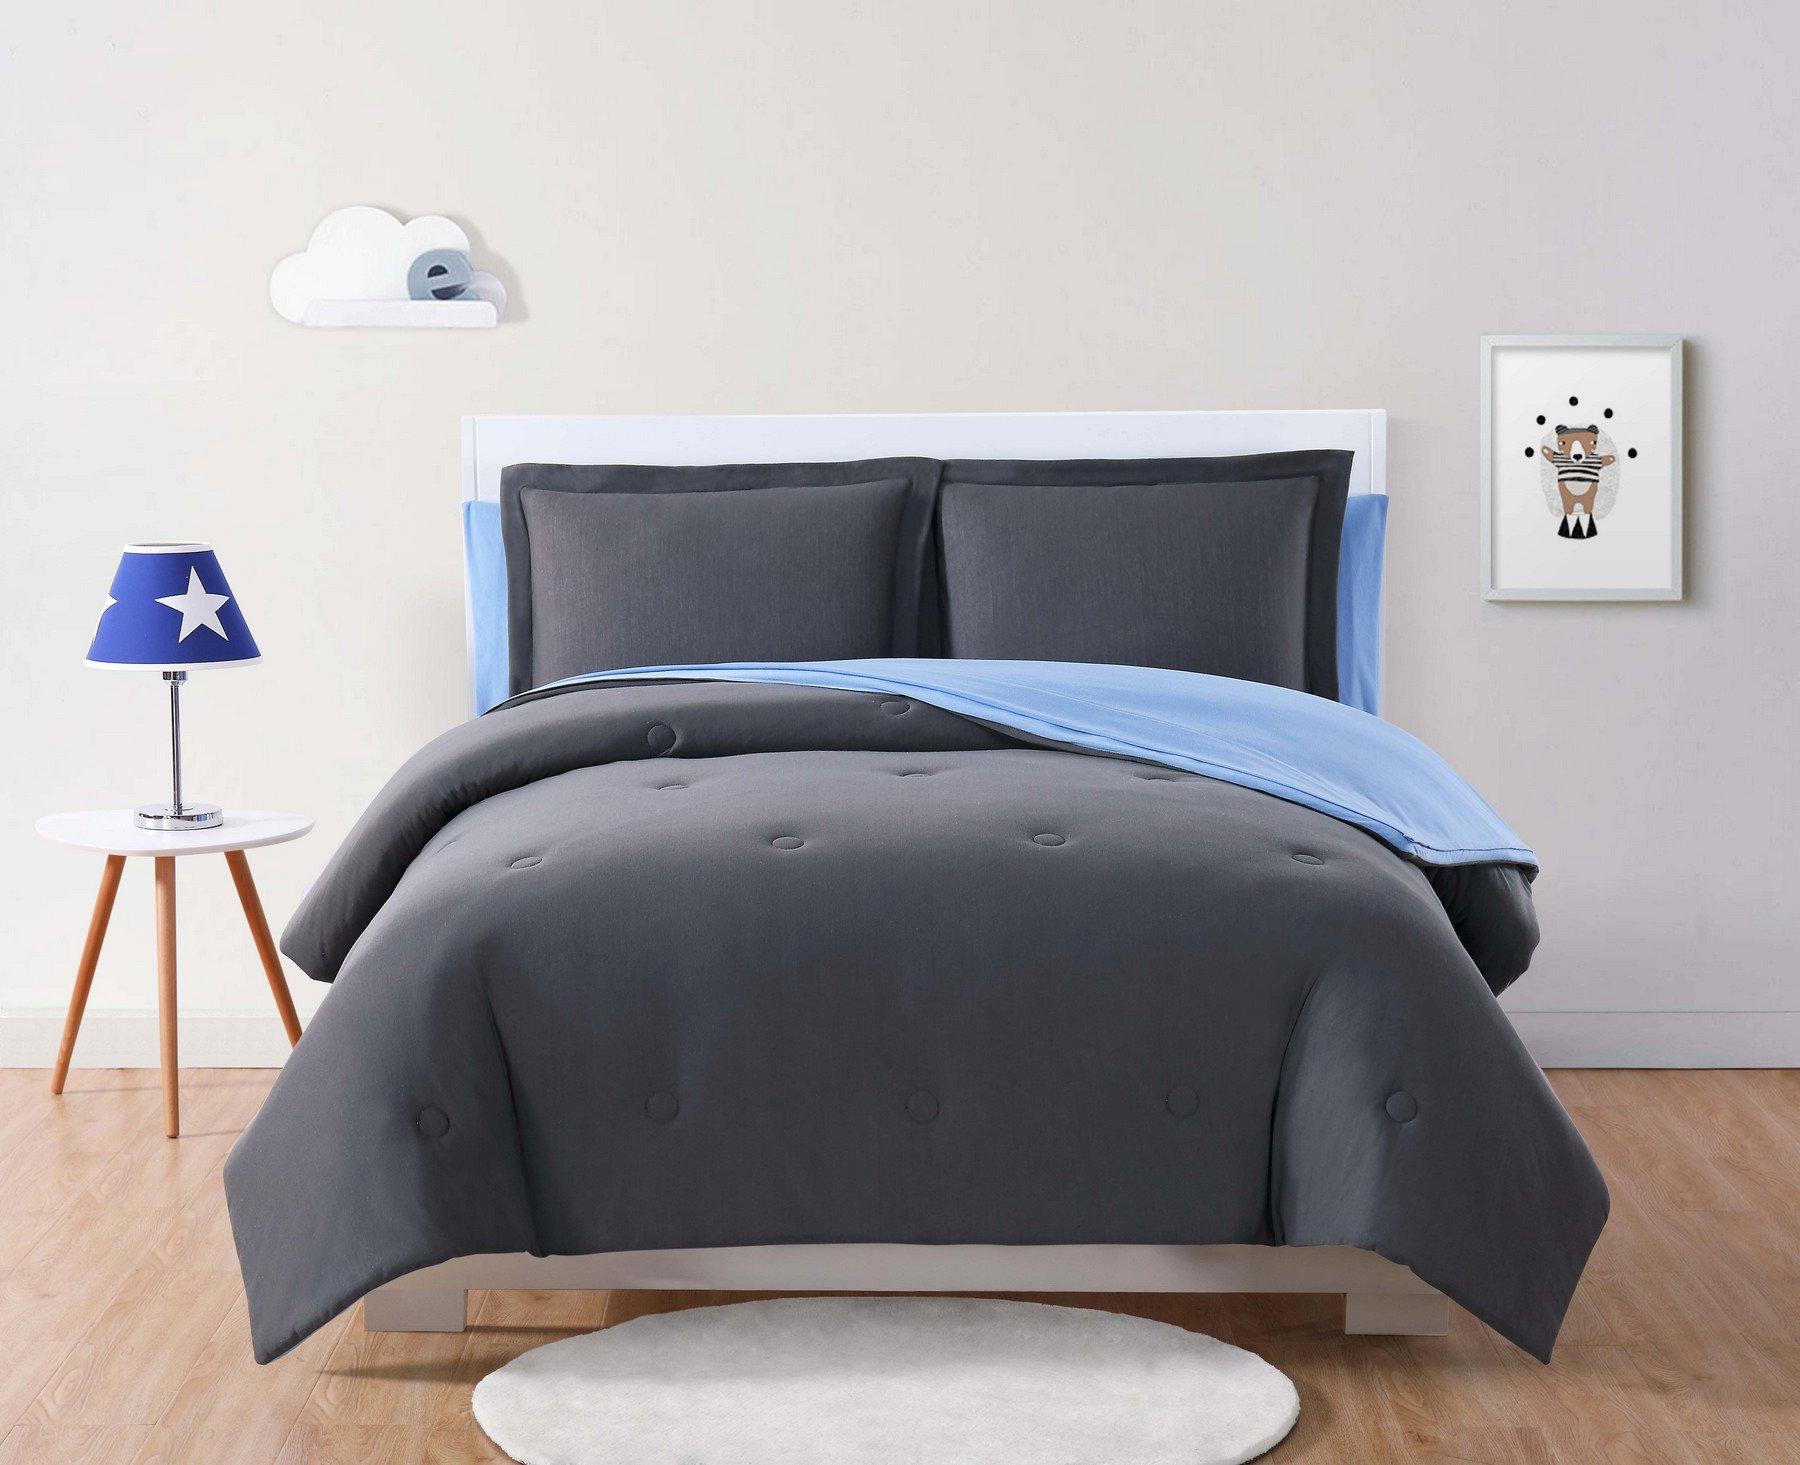 Laura Hart Kids BIB2399CBFU-00 Jersey Bed in a Bag, Full, Charcoal